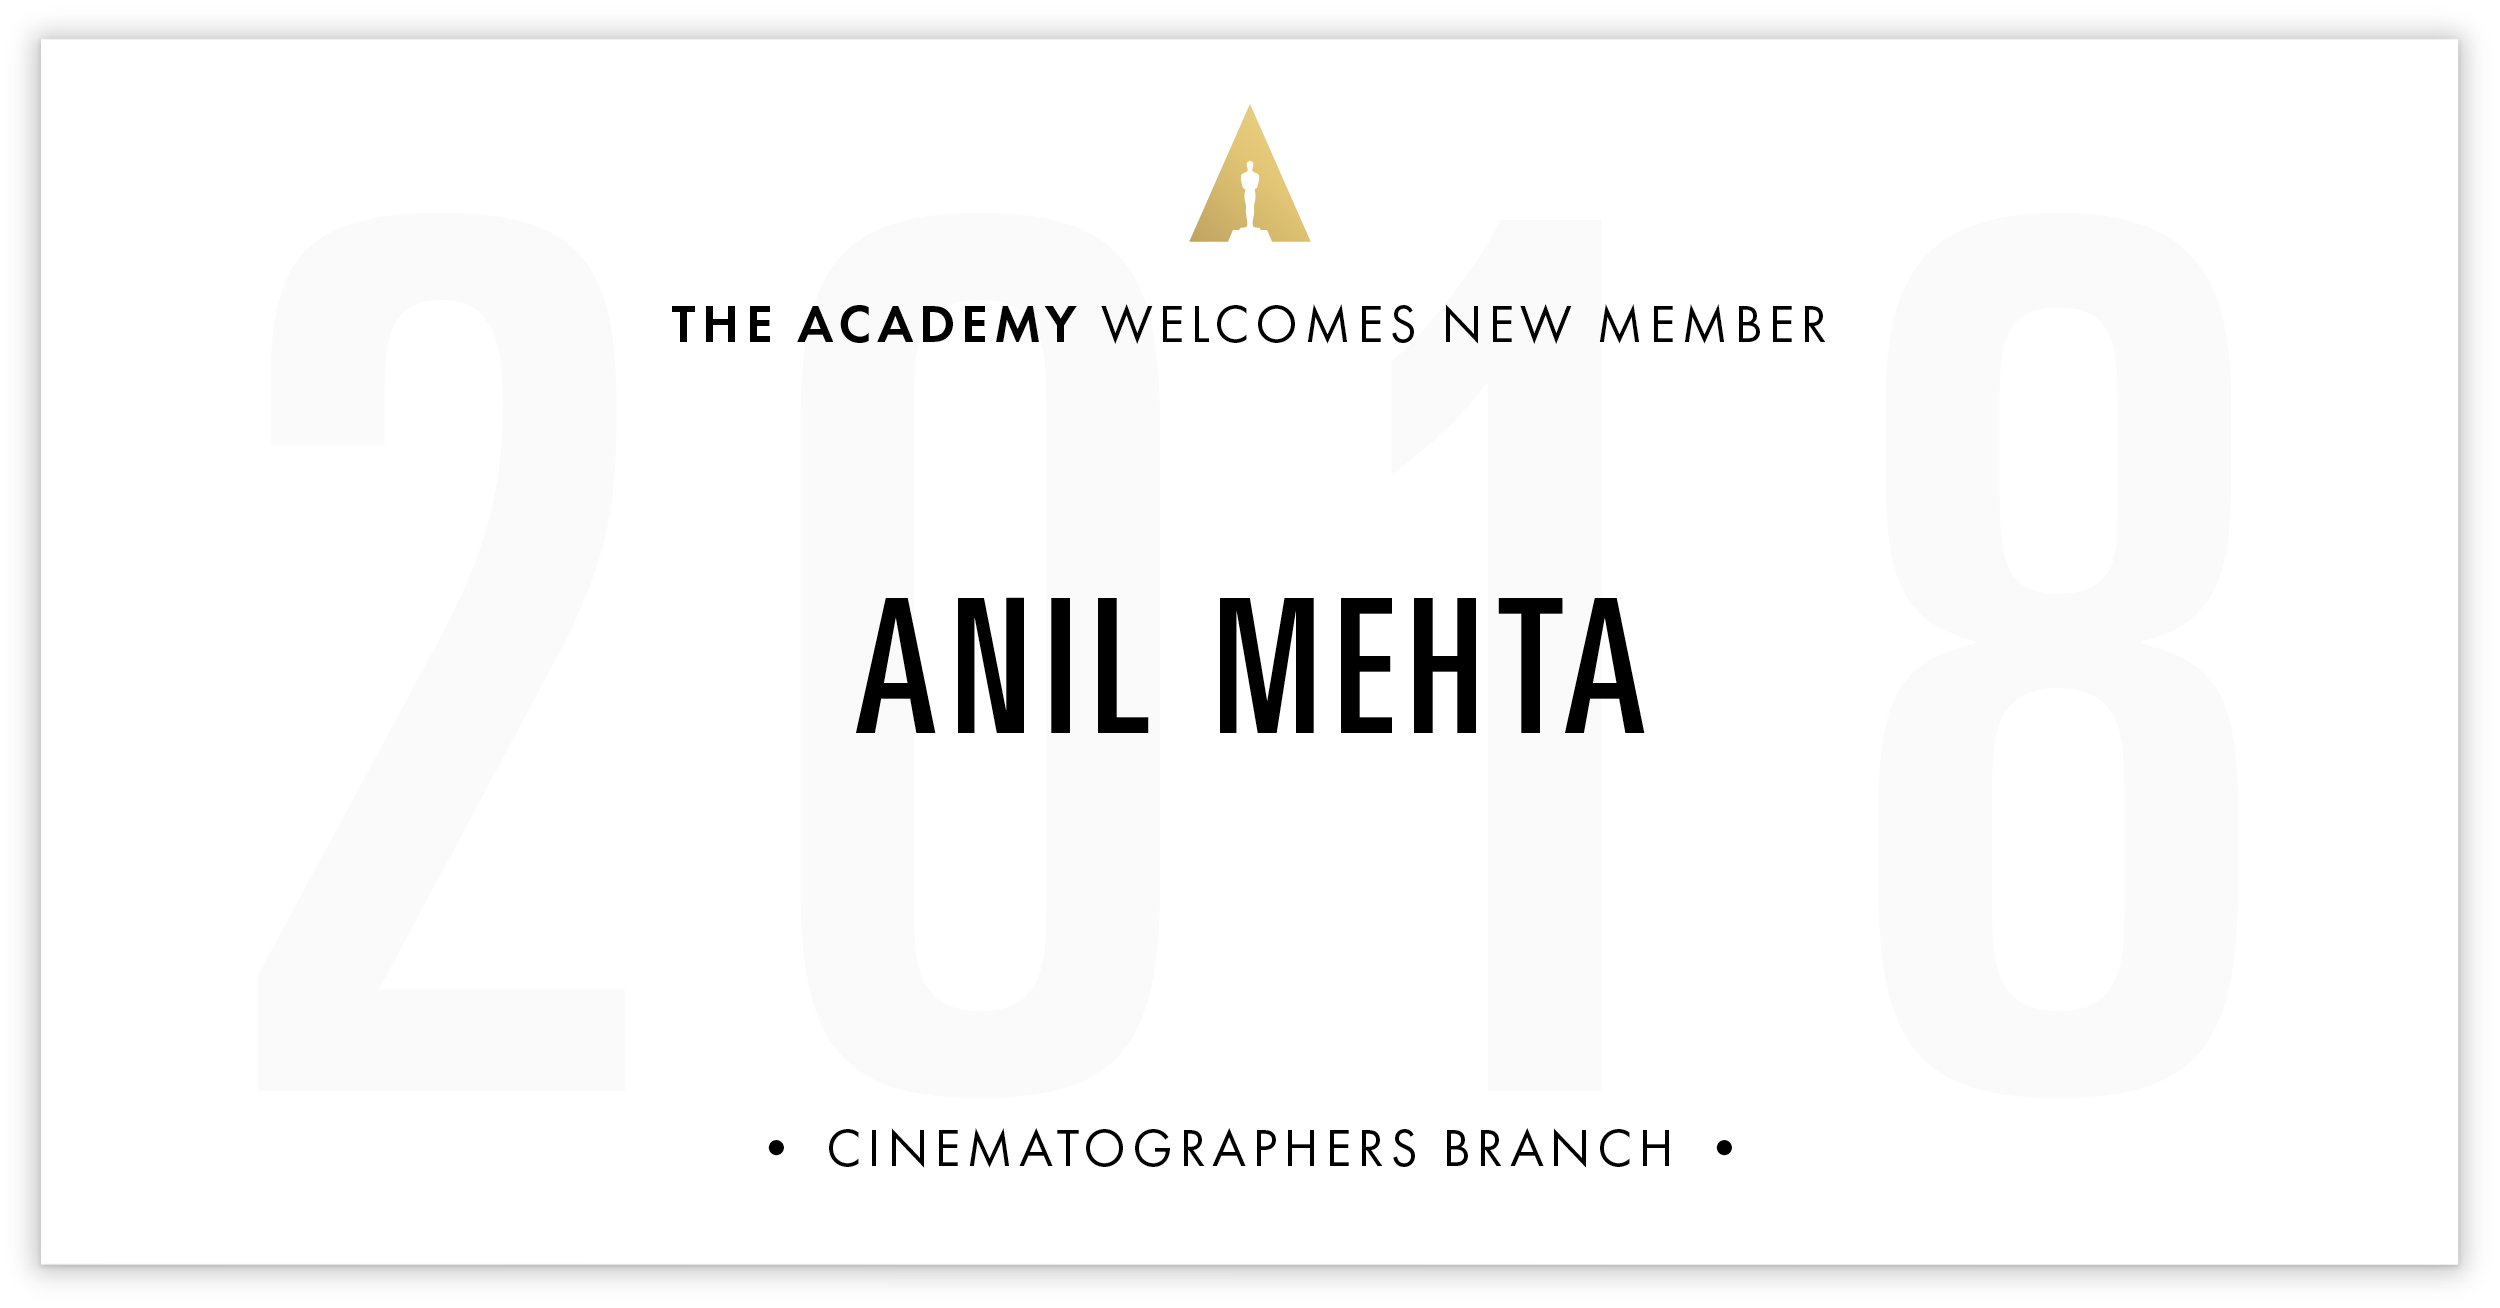 Anil Mehta is invited!